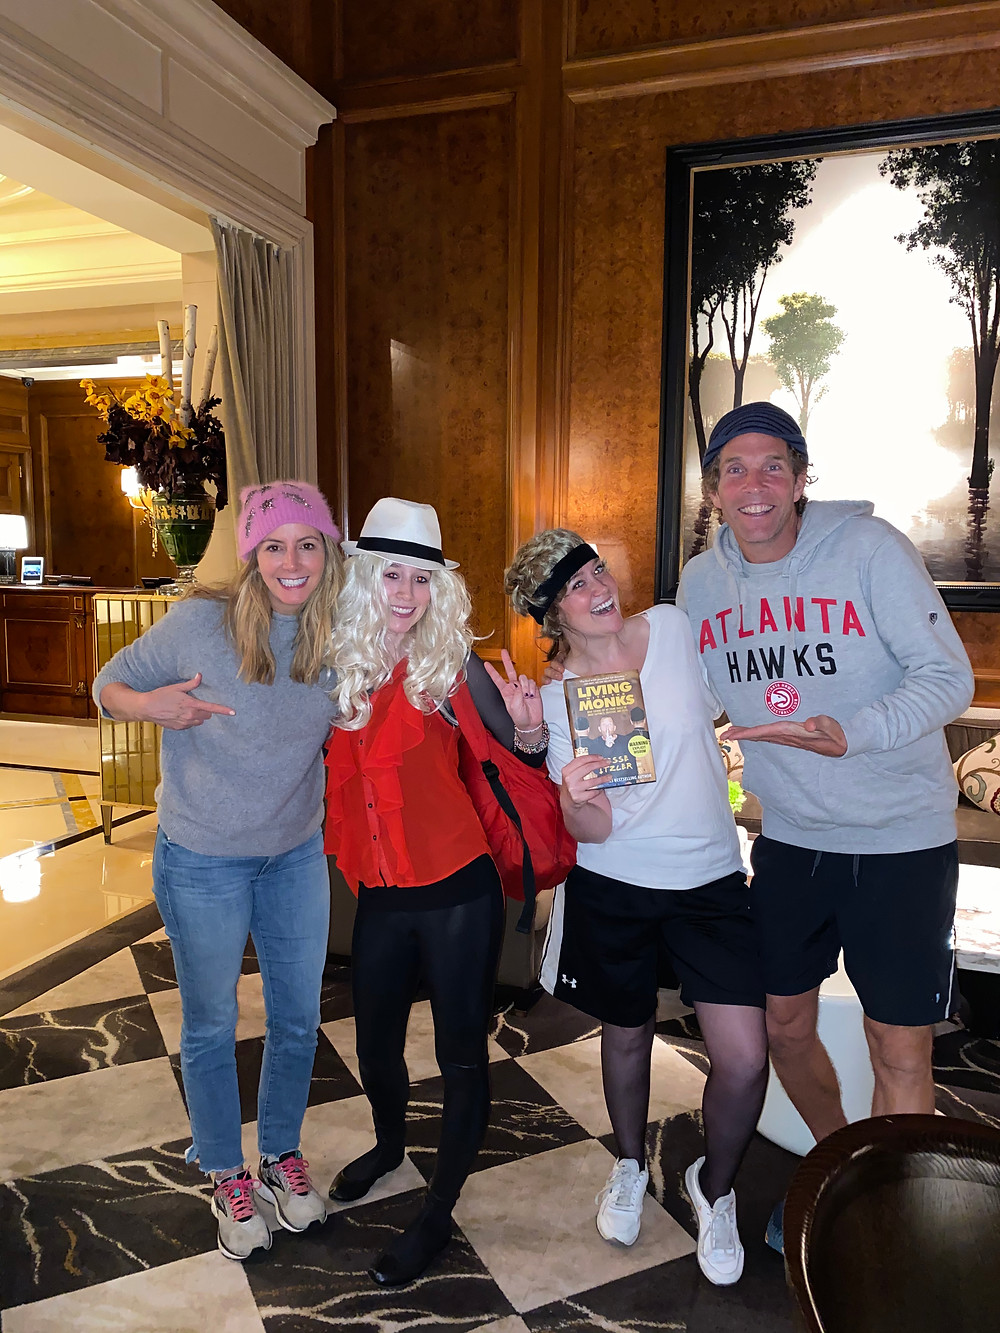 Sister entrepreneurs posing with Sara Blakely and Jesse Itzler